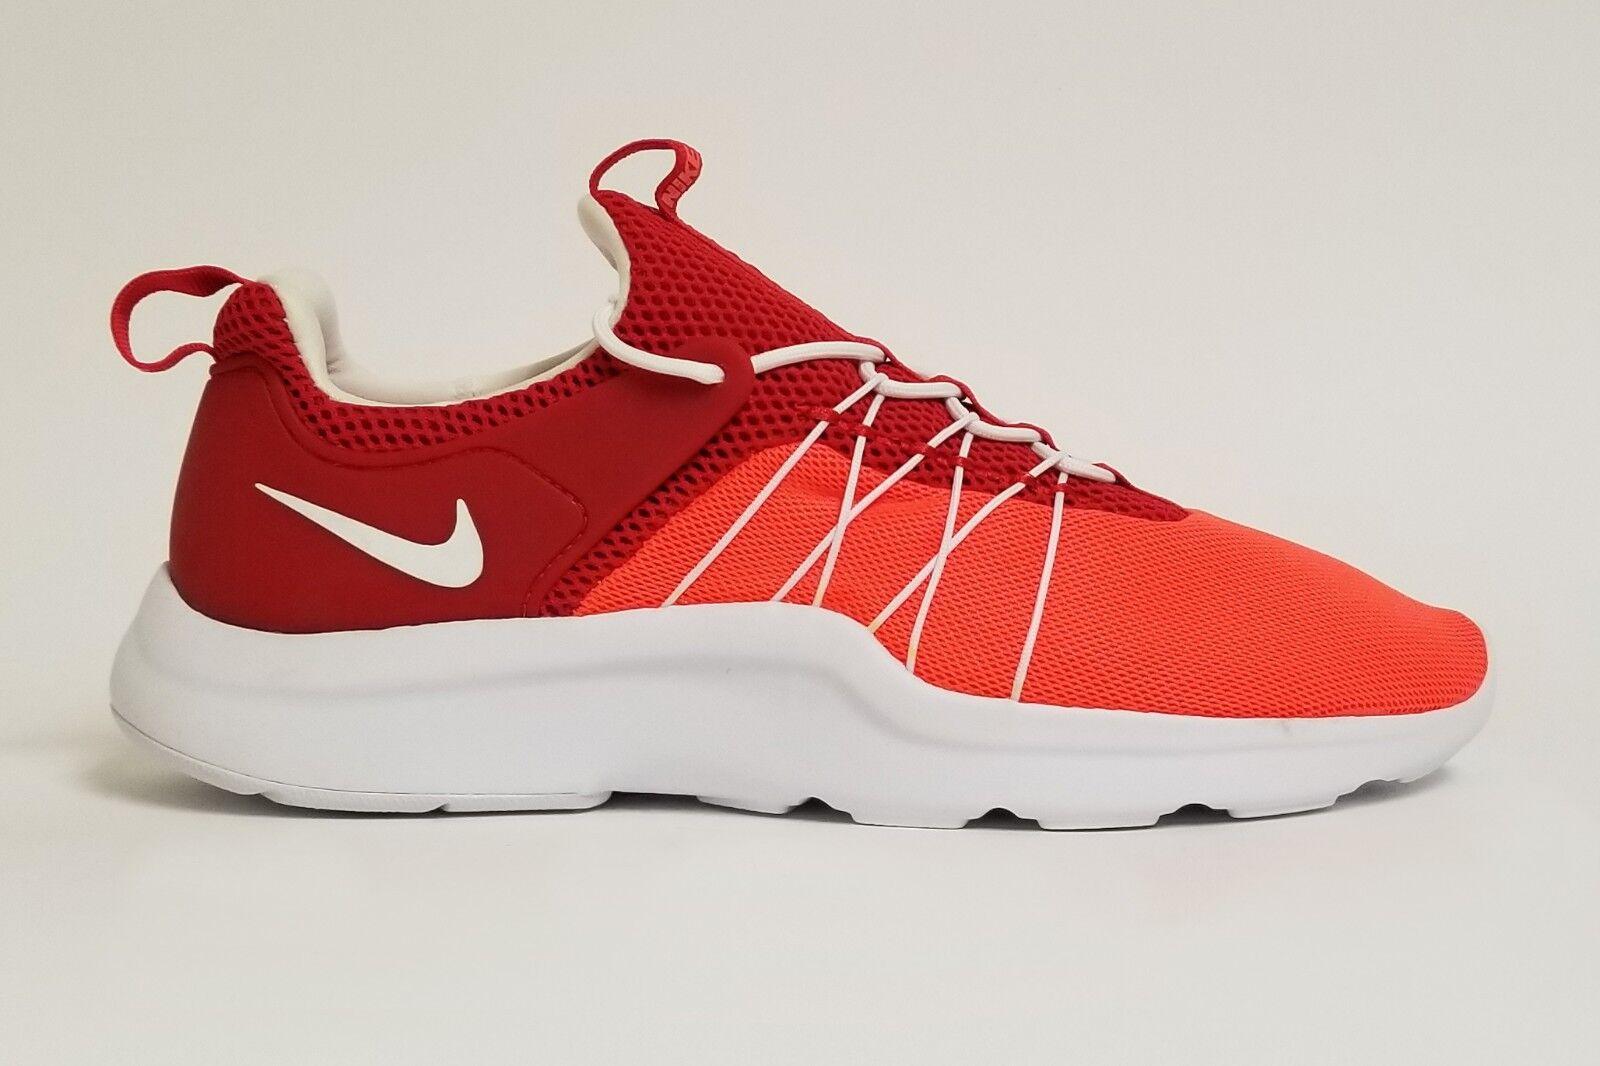 Nike Men's DARWIN Running Shoes Crimson/White/Red 819803-816 a Size 9.5 / 10